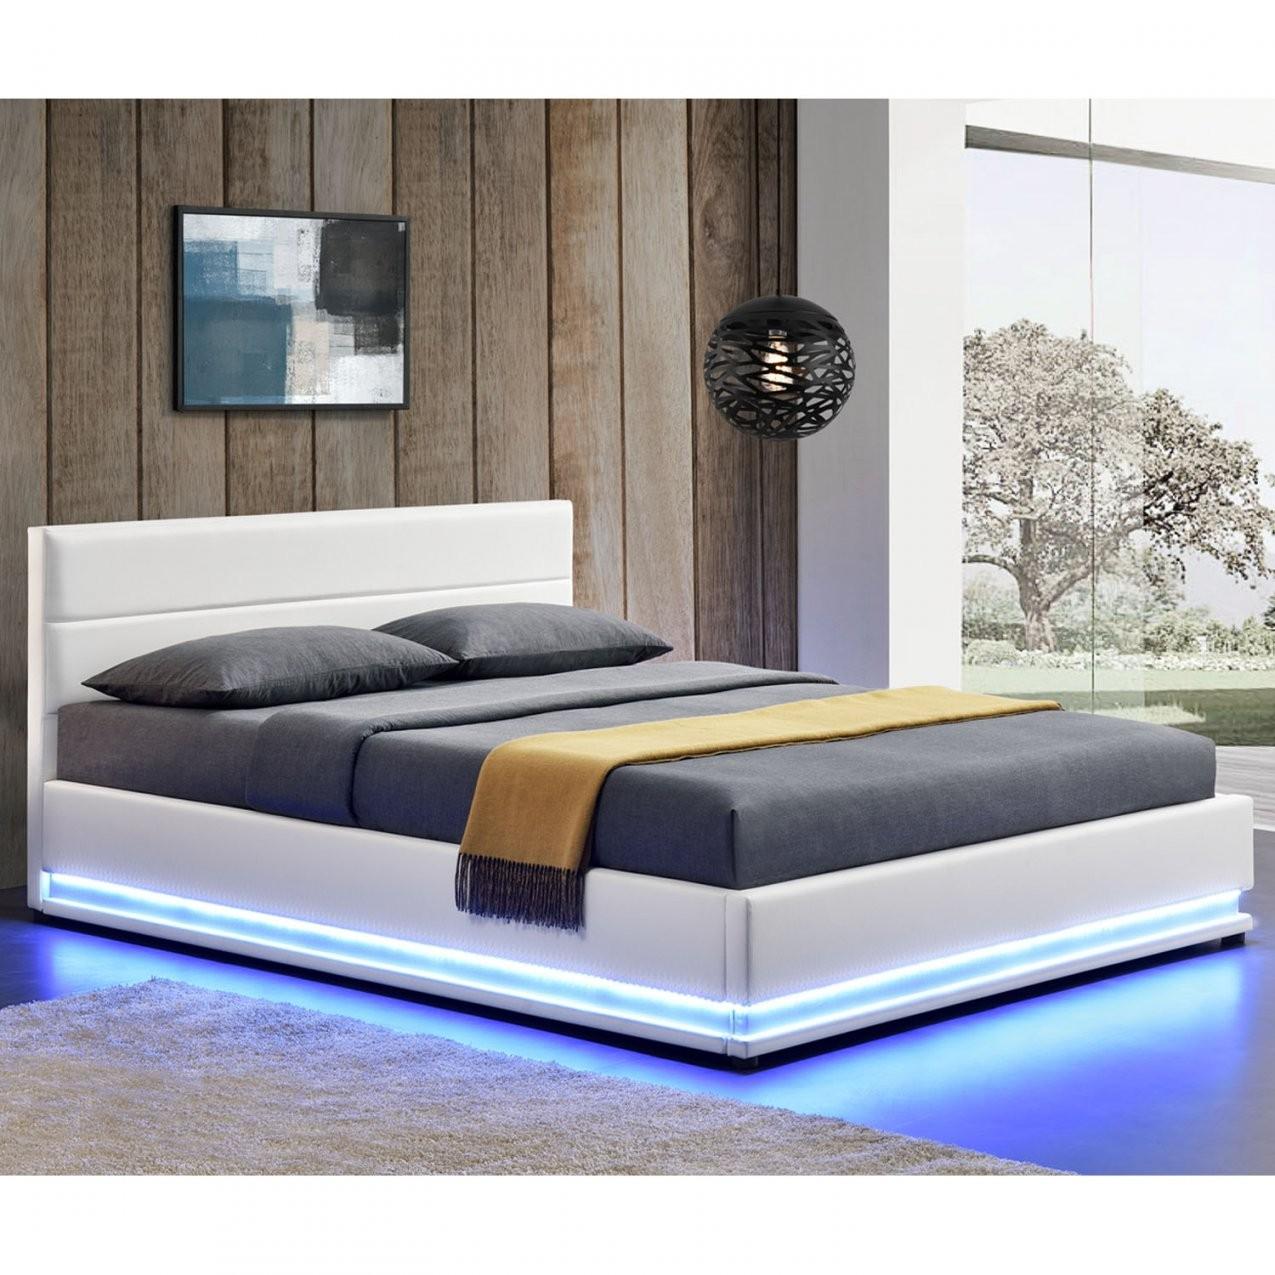 Polsterbett Led Doppelbett Bett Bettgestell Lattenrost von Led Bett 120X200 Bild